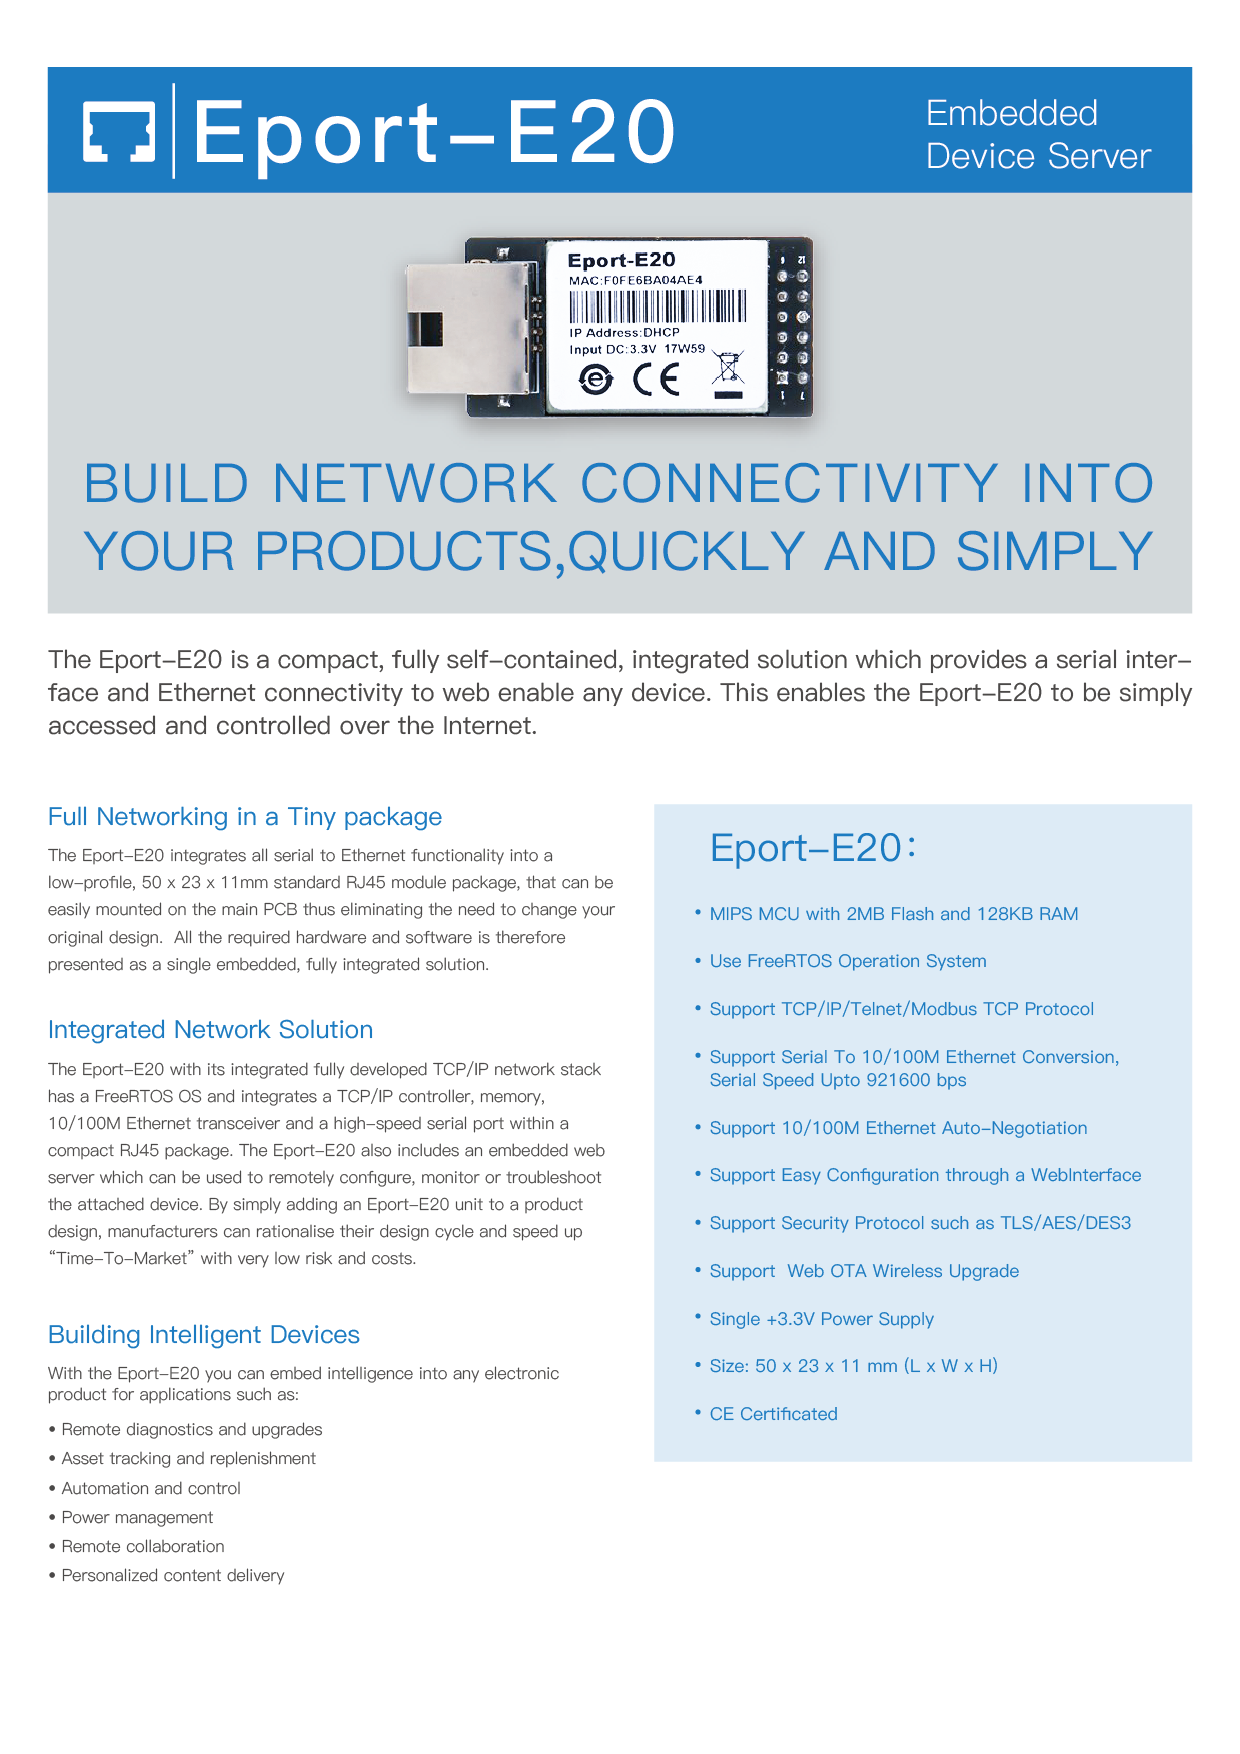 US$ 4 93 - HF Super Ethernet Port FreeRTOS Eport-E20 Cortex